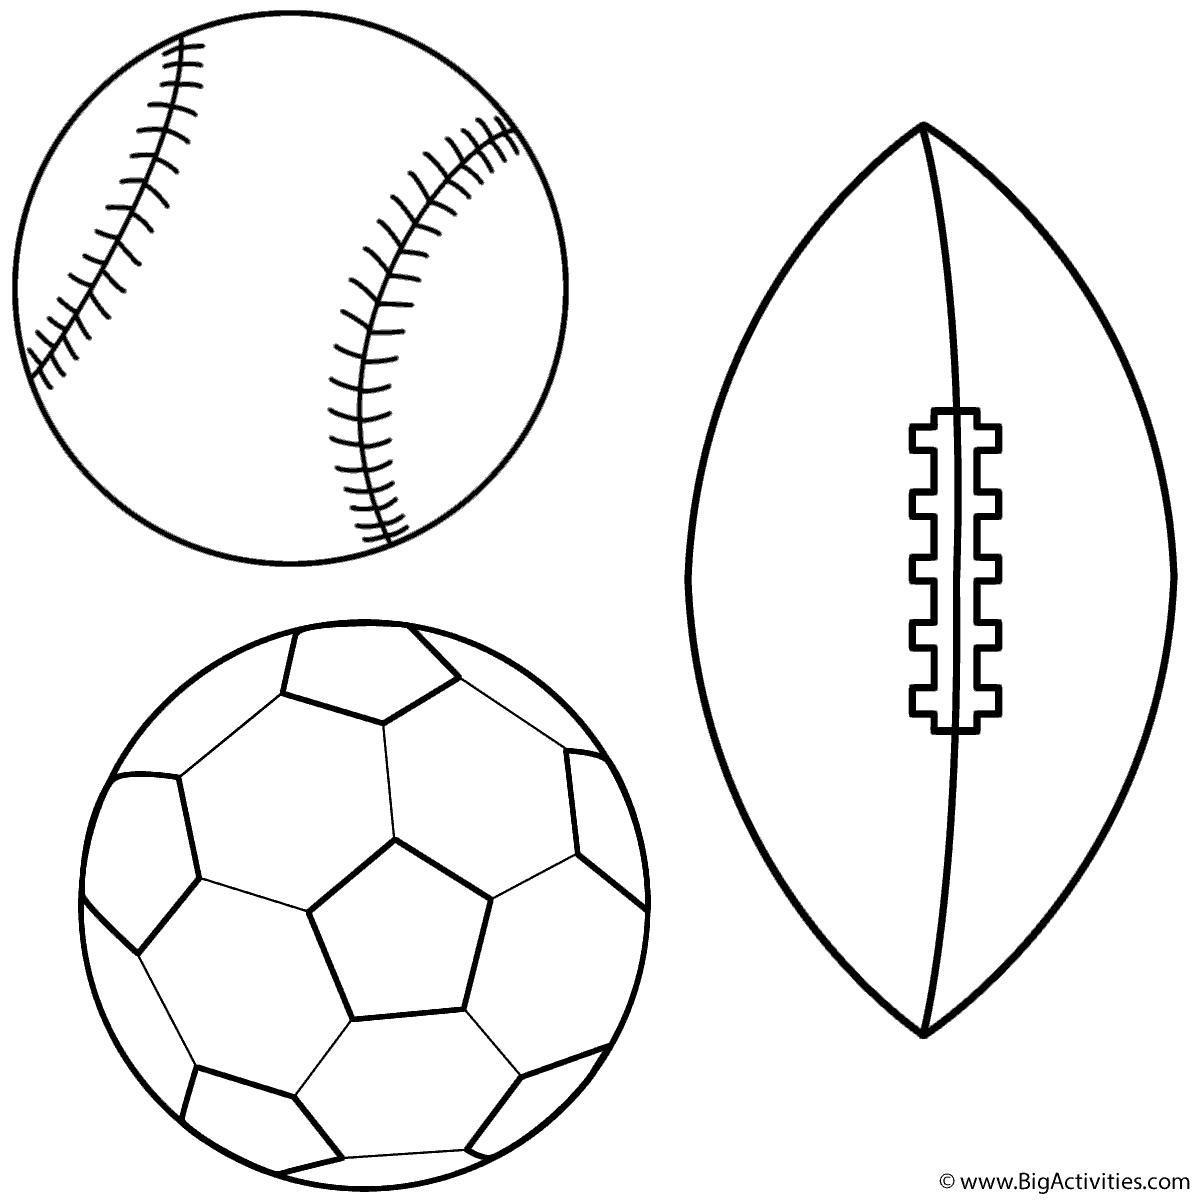 Printable Football Field